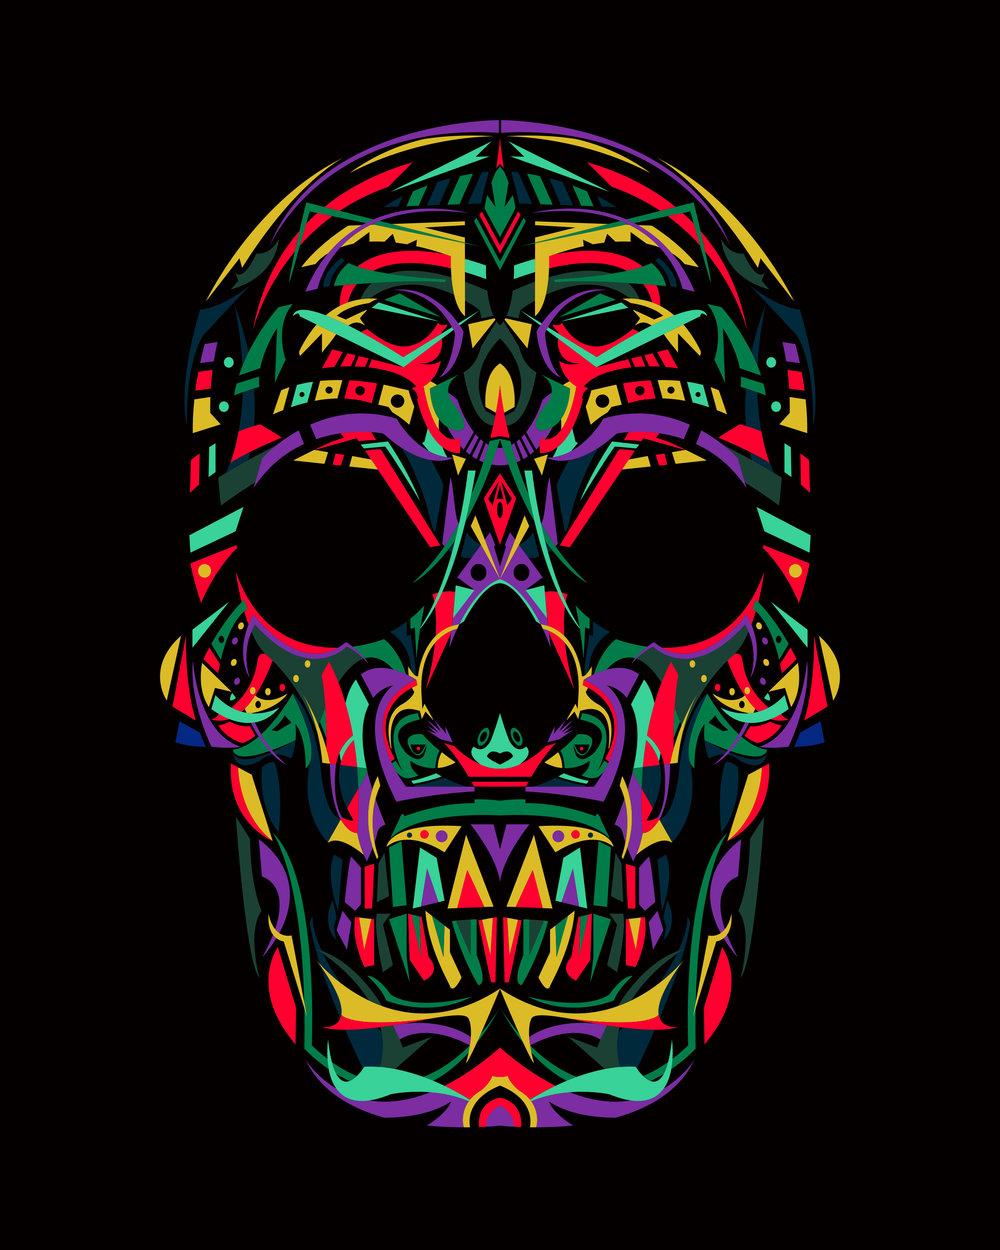 Viva_skull.jpg